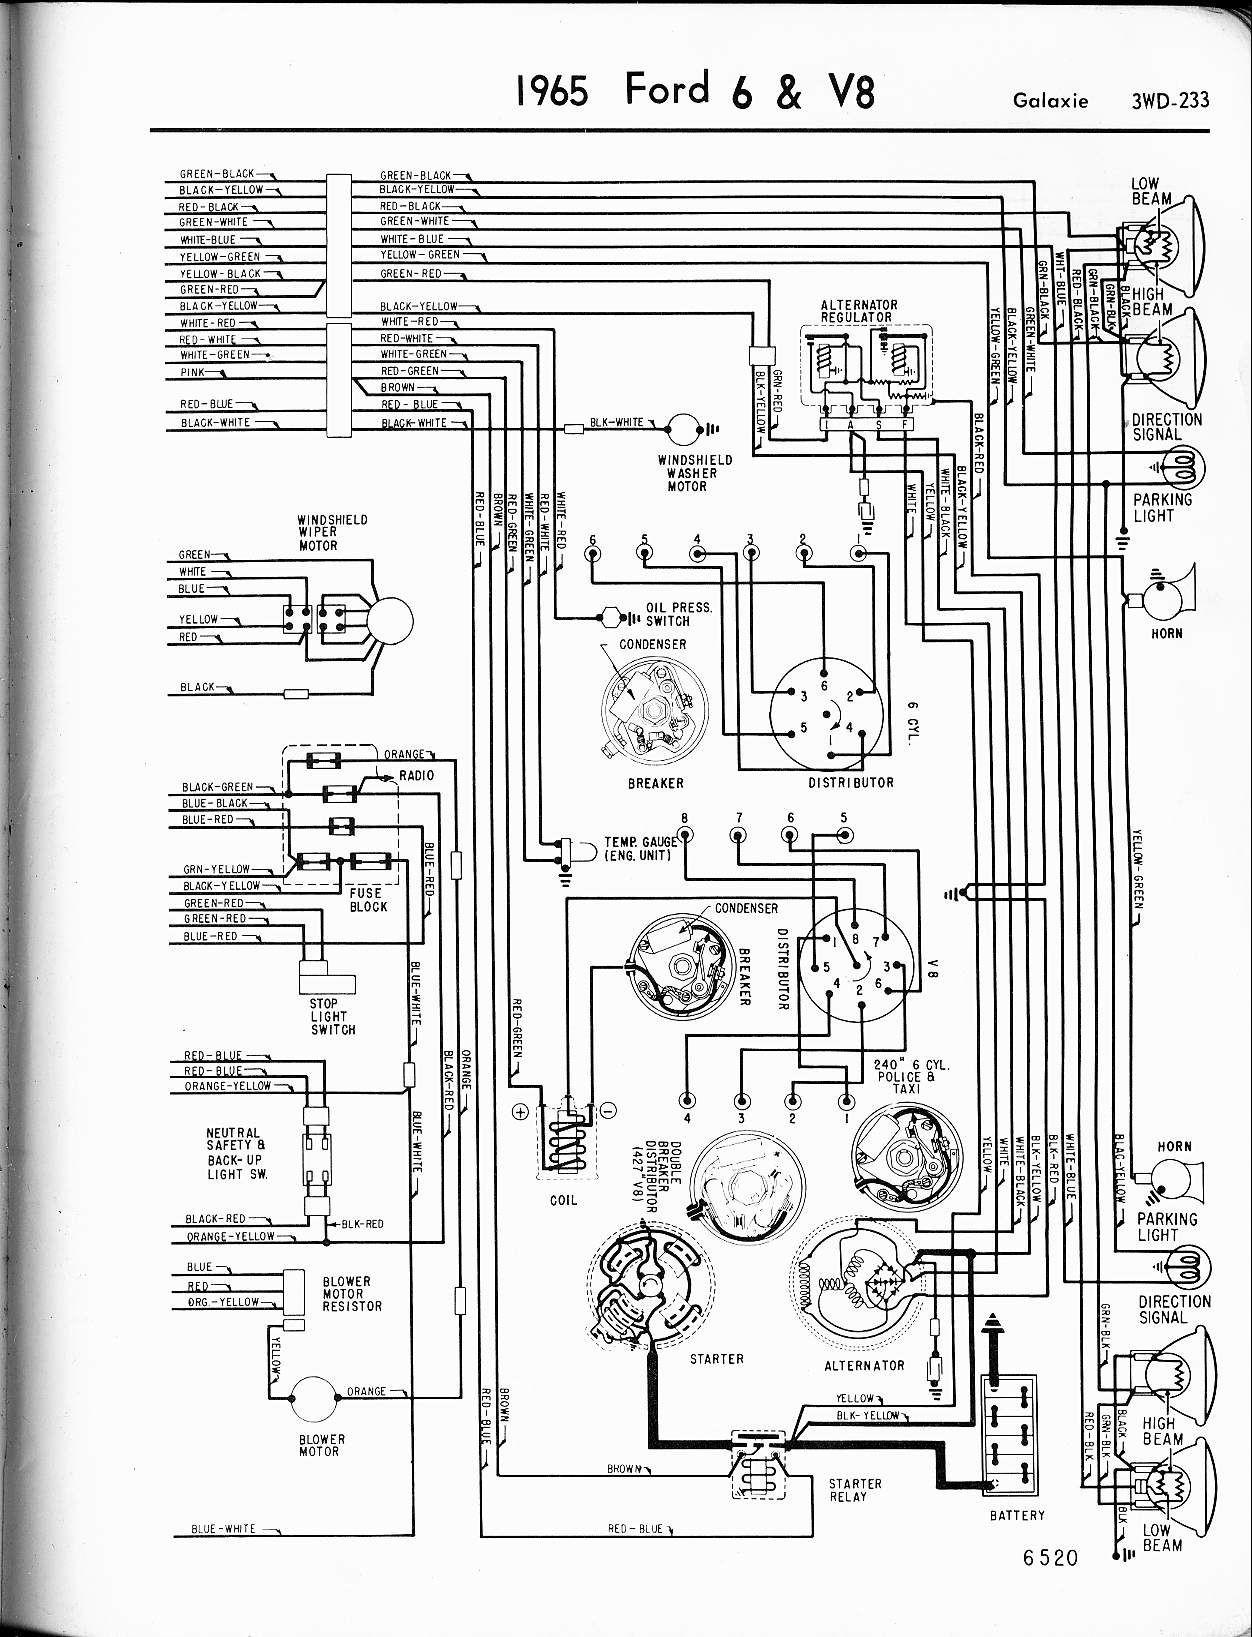 1965 Mustang Wiring Diagram 1965 ford Wiring Diagram Wiring Diagrams Of 1965 Mustang Wiring Diagram